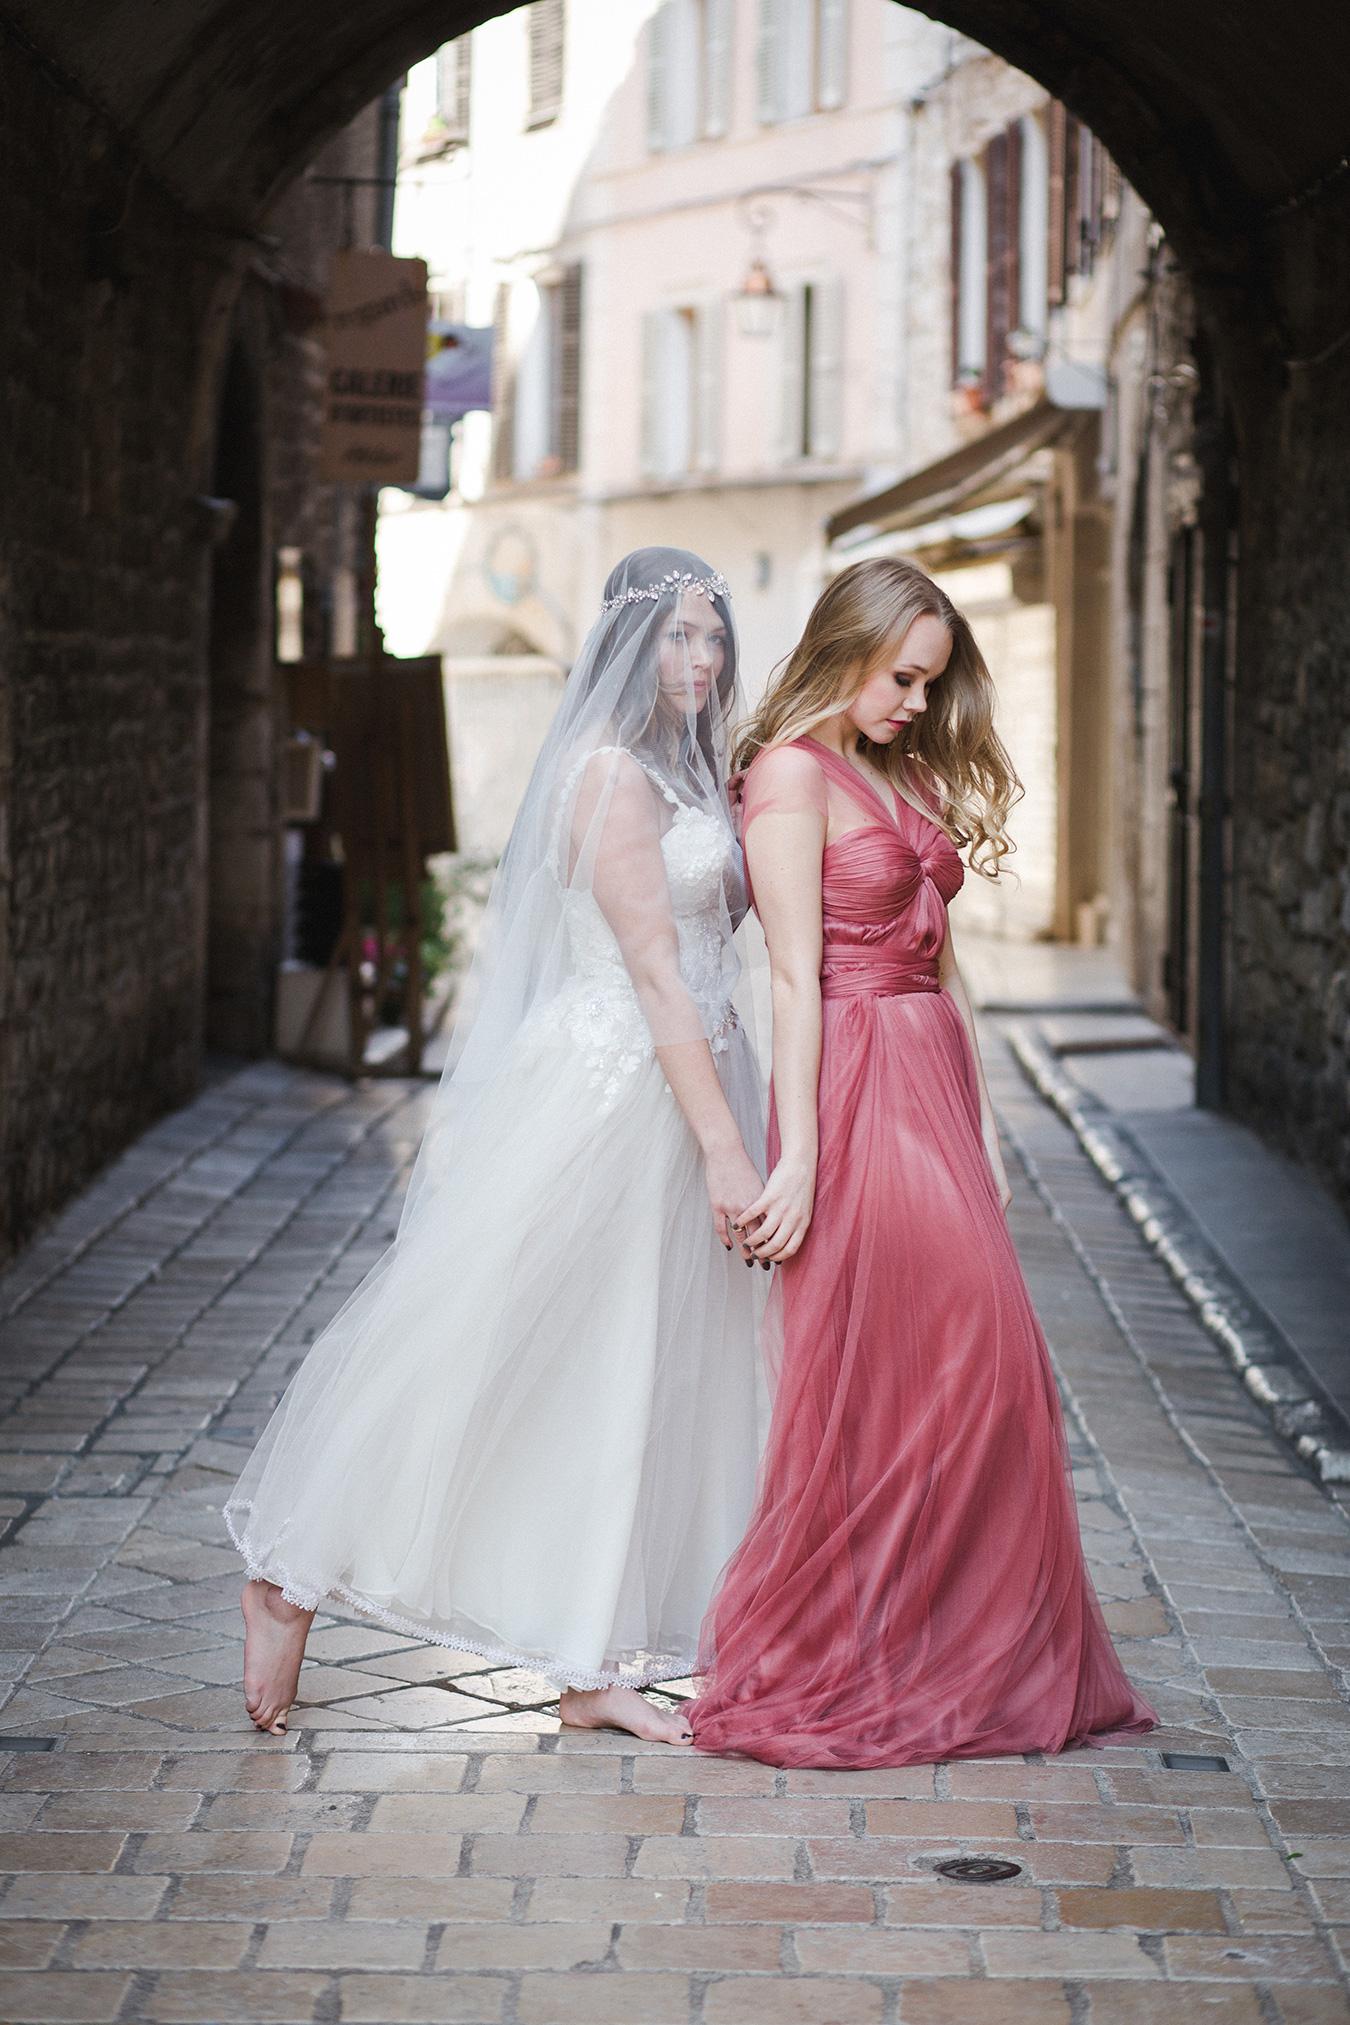 001-fotograf-tone-tvedt-bryllup-i-utlandet.jpg